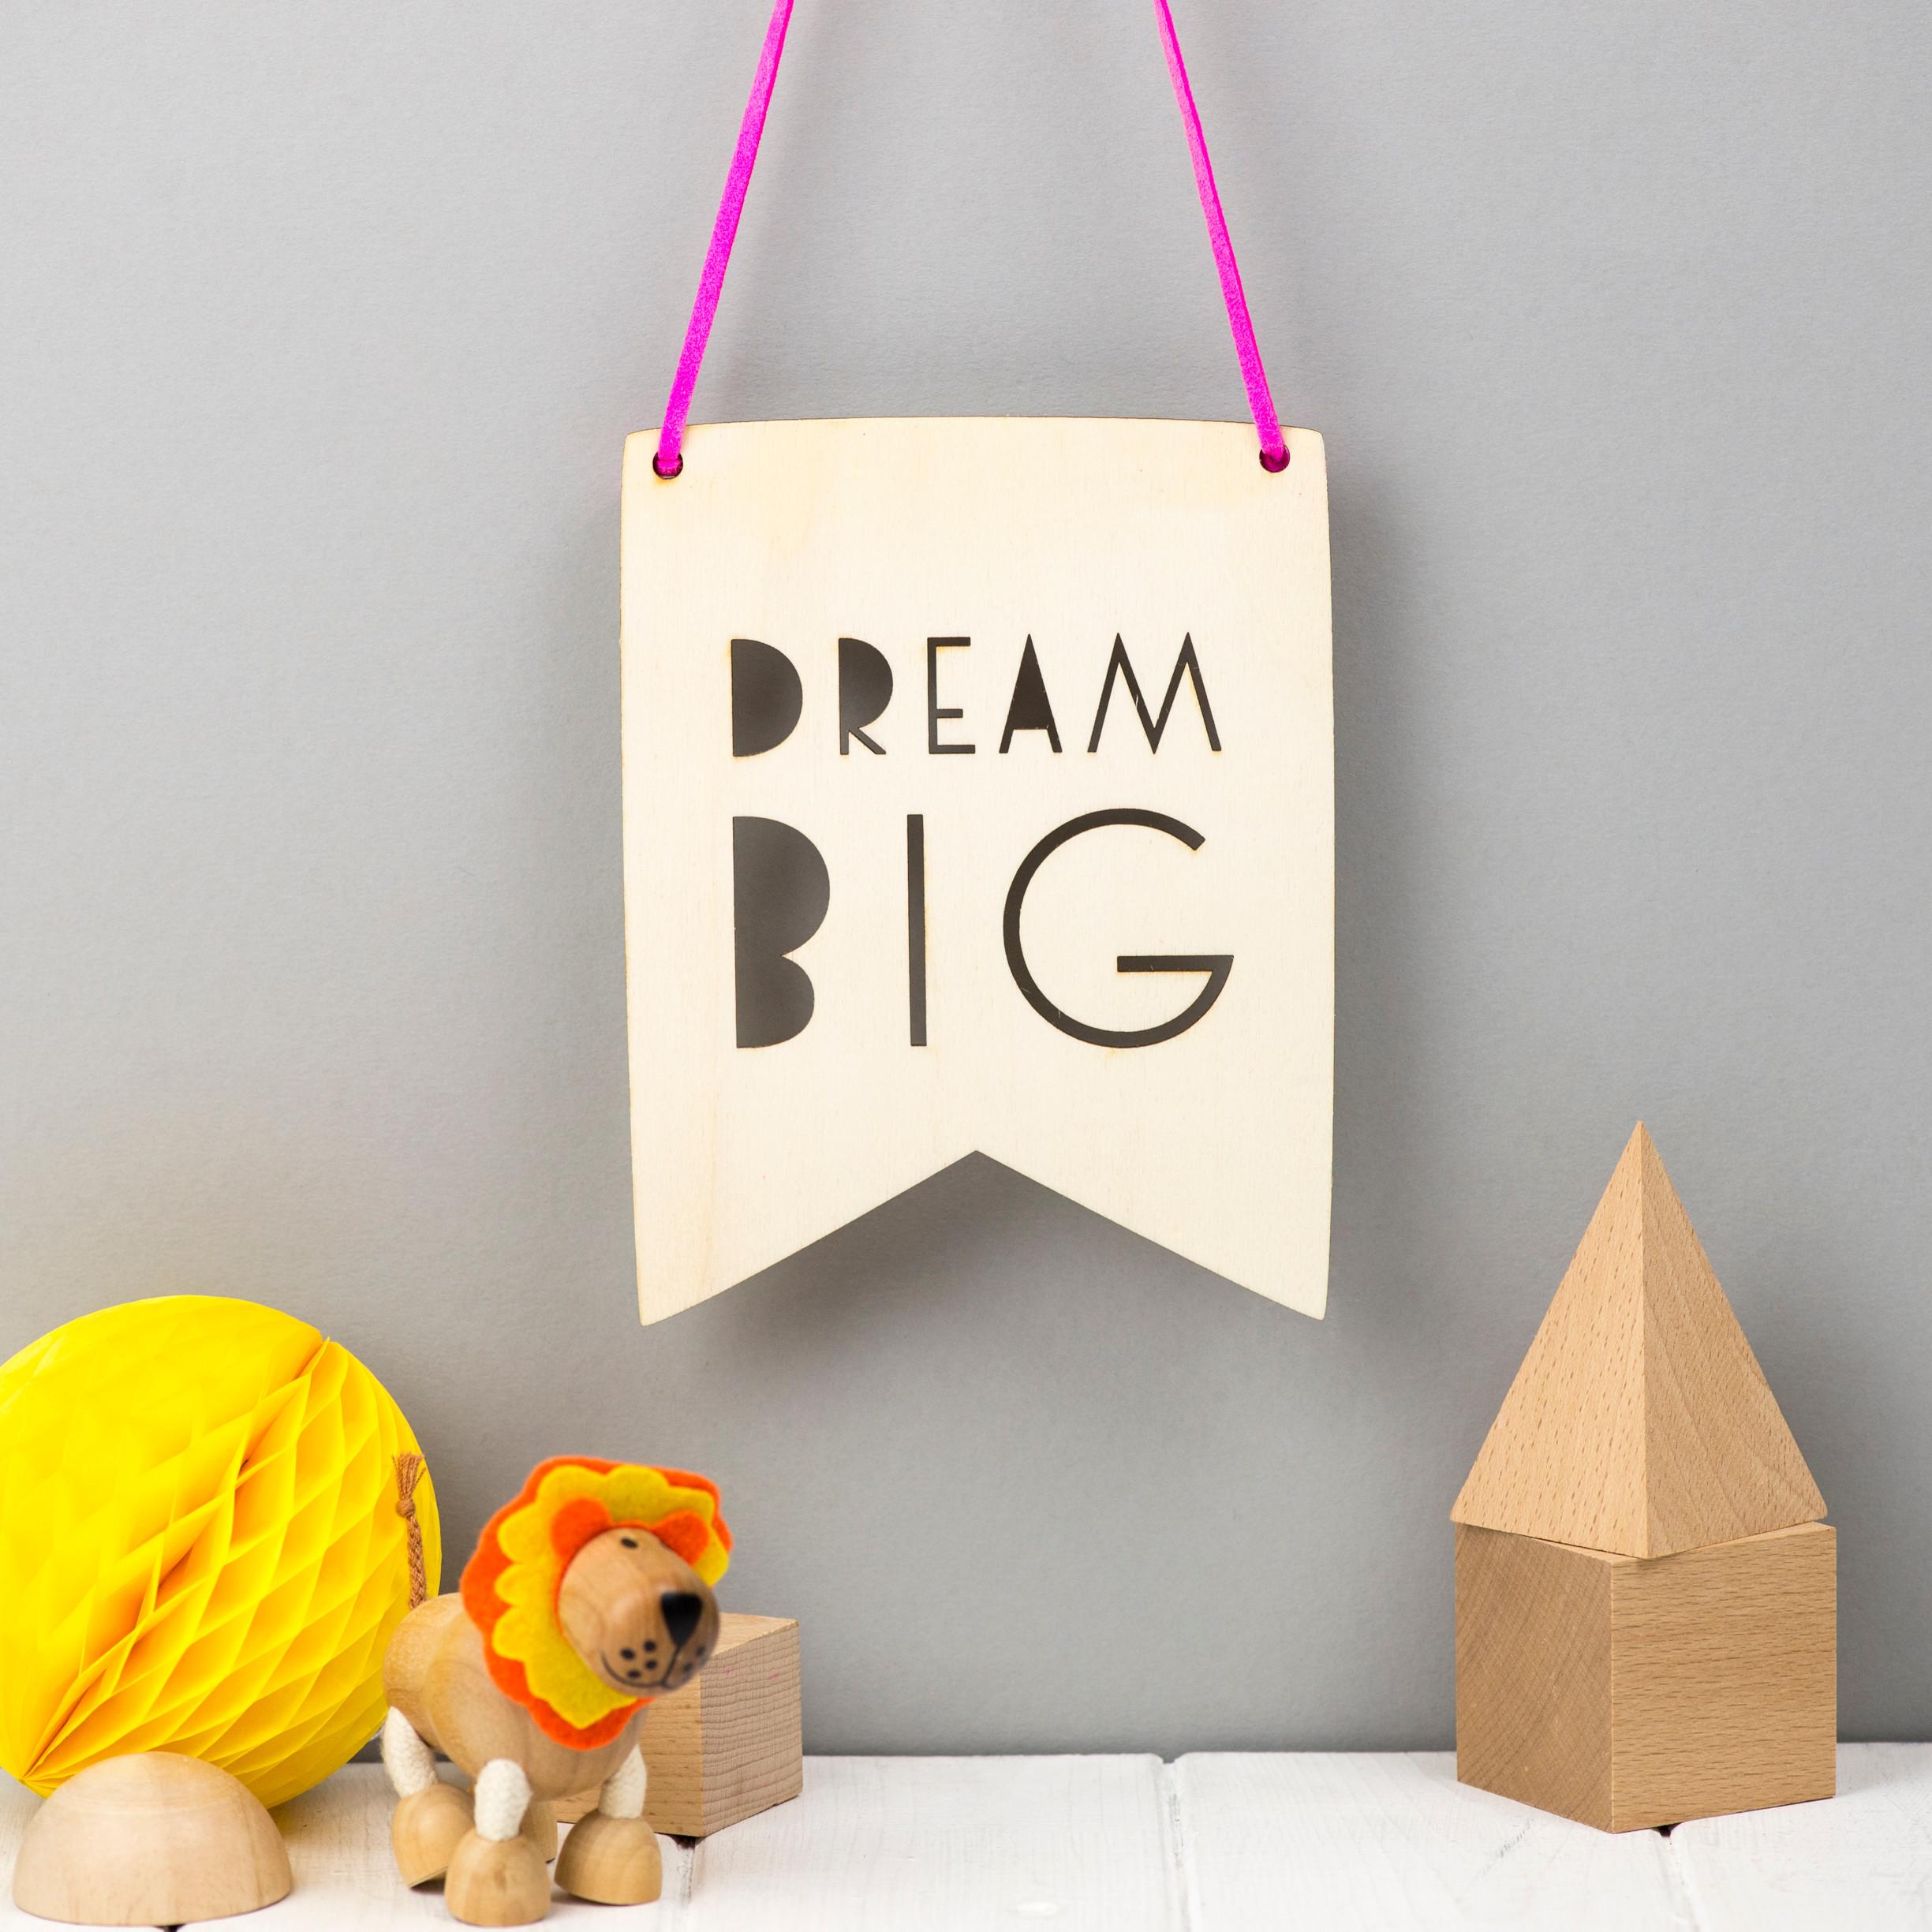 Quirky Wedding Gift Ideas Australia : Dream Big Typographic Style Wooden Pennant hardtofind.